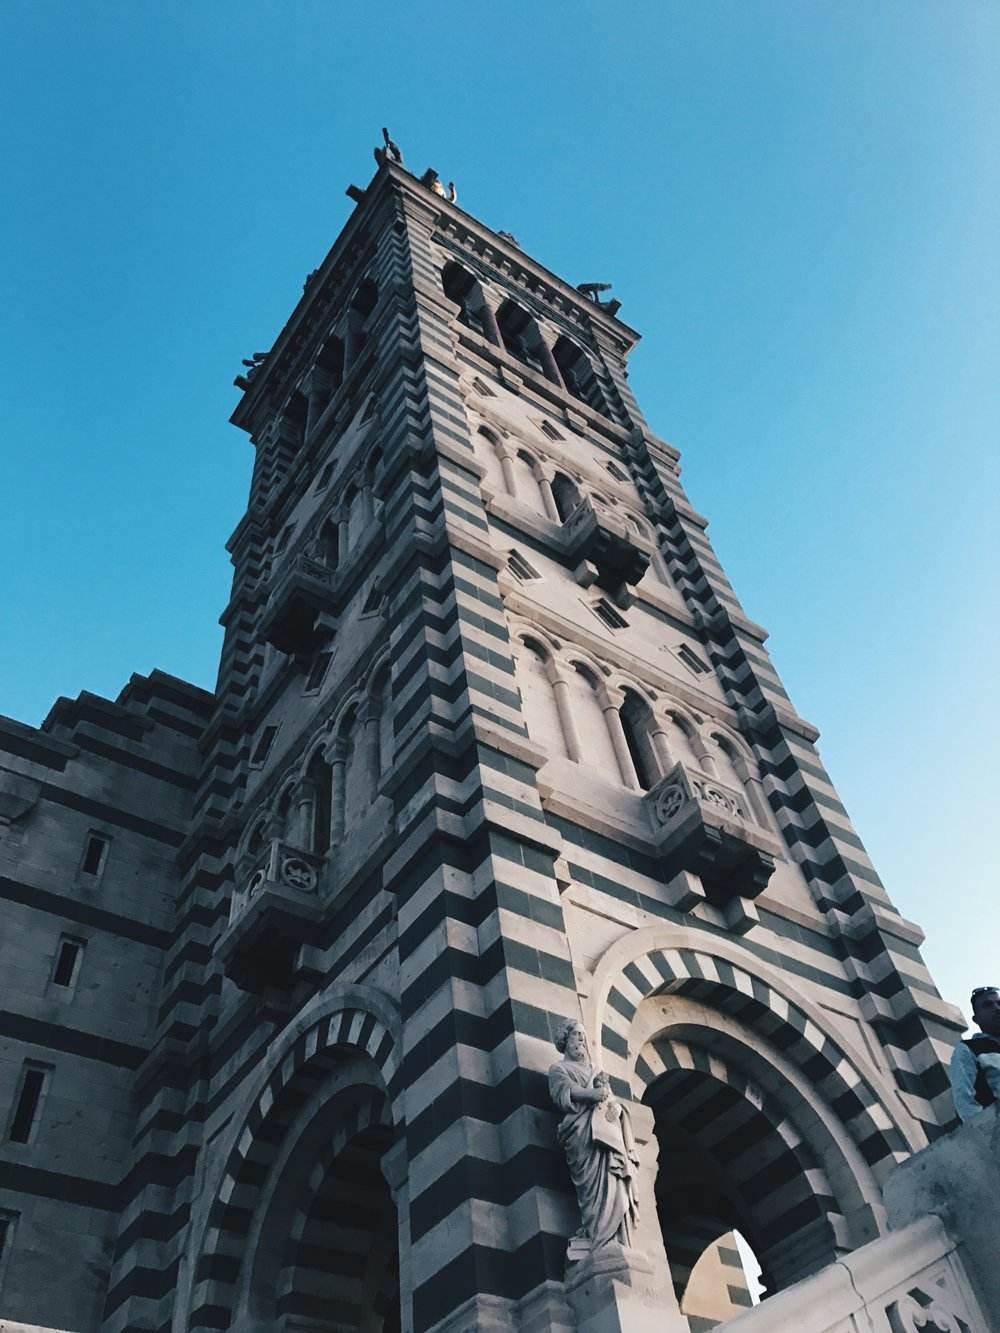 Marseille France Notre-dame de la Garde